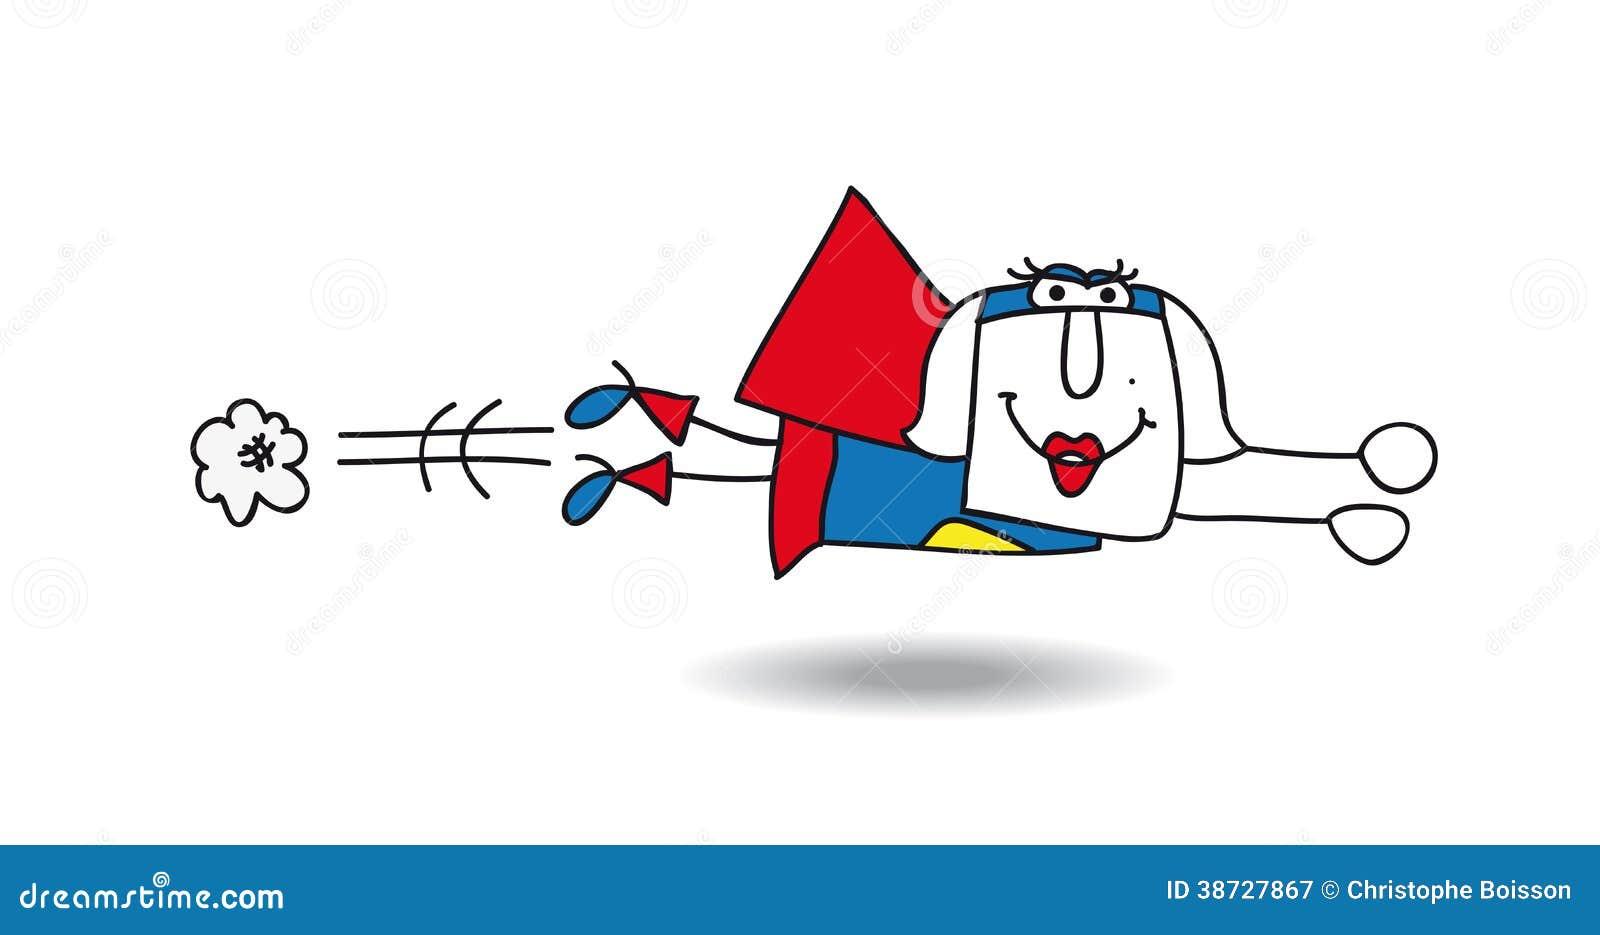 Karen Superwoman Royalty Free Stock Photography - Image: 38727867 Superhero Flying Vector